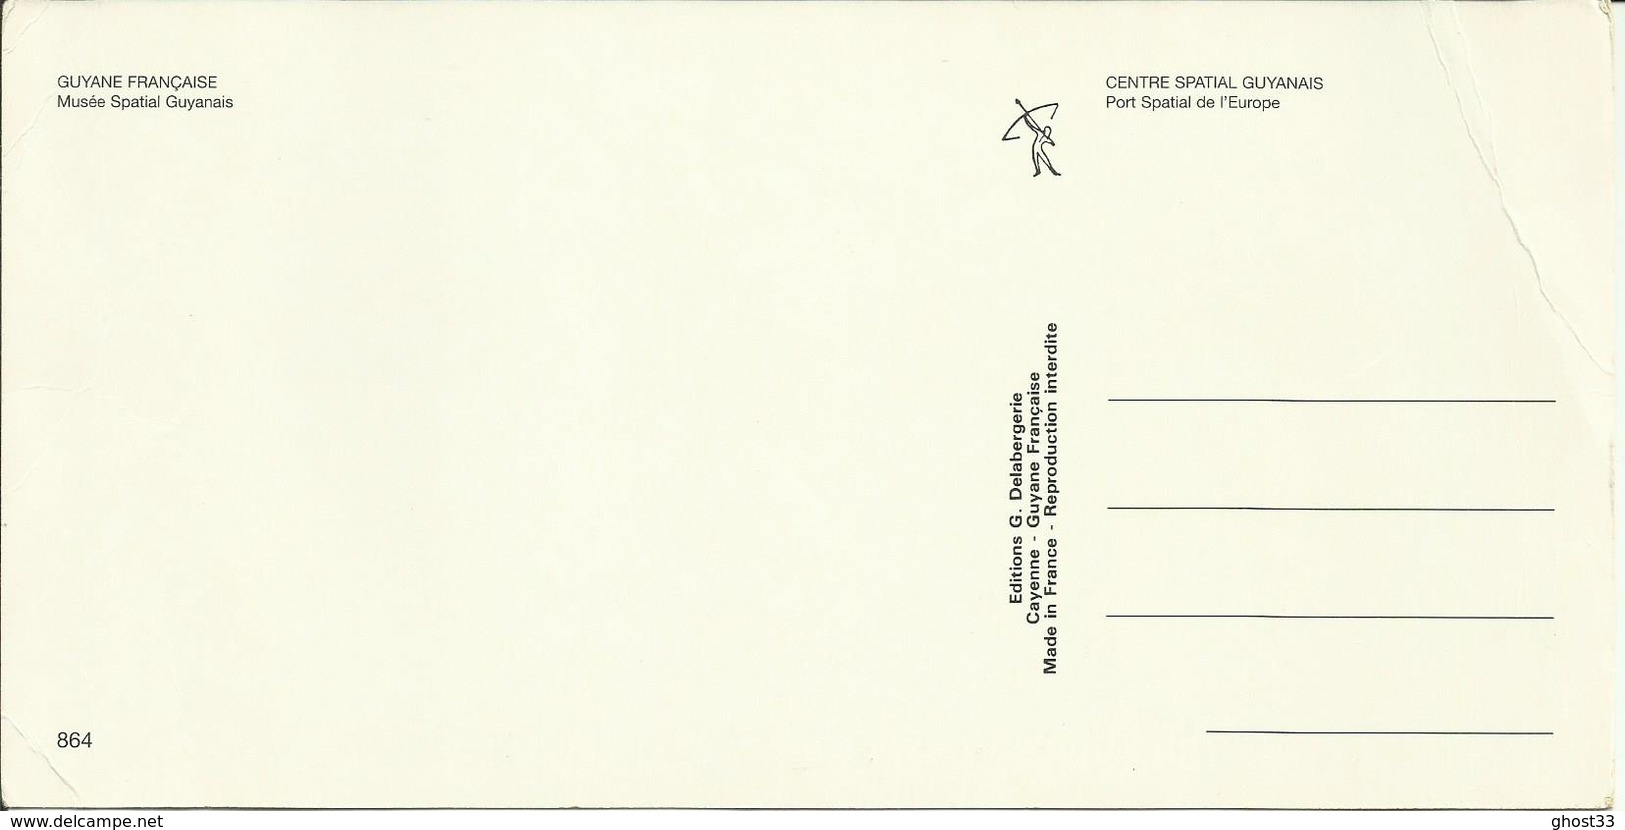 MAXI CARTE POSTALE - GUYANE - KOUROU - Musée Spatial - Editions G. DELABERGERIE N° 864 - Guyane